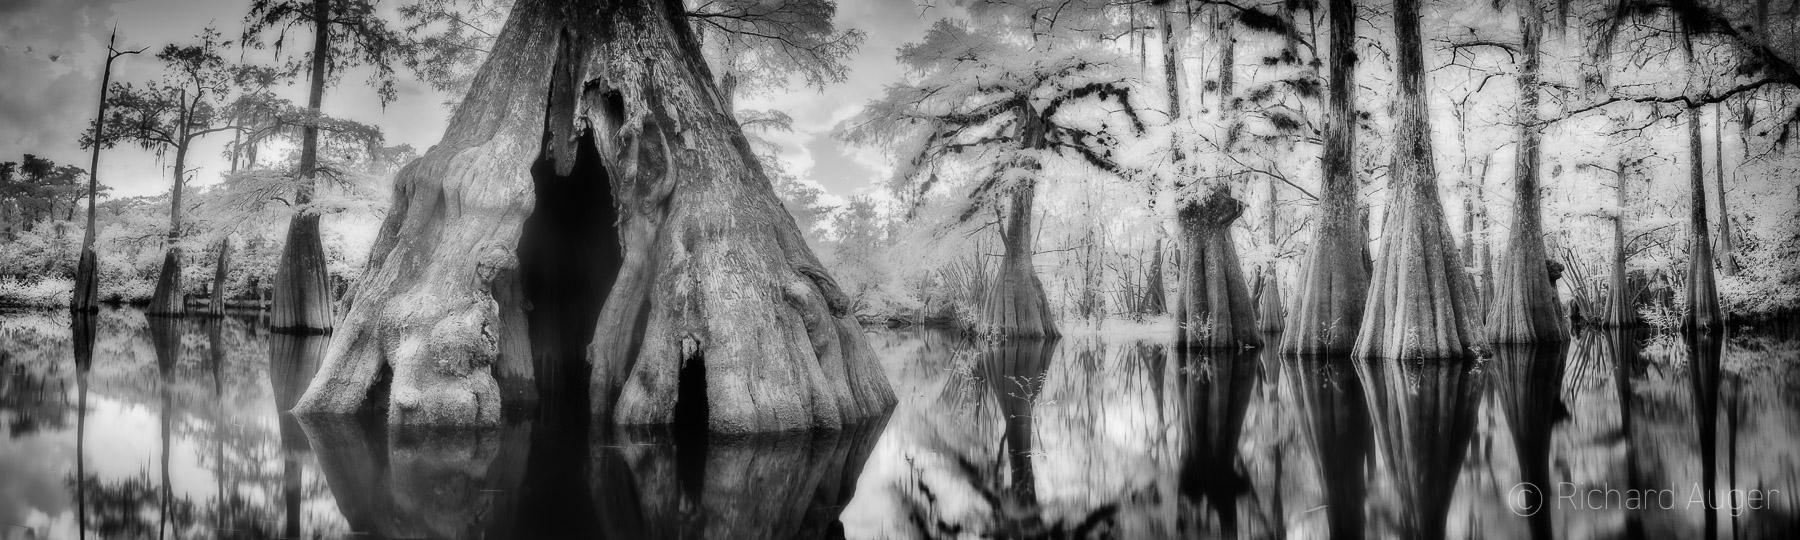 Suwannee River, Florida, Giant Cypress Trees, Water, Swamp, Sepia, Monochrome, Richard Auger, sepia tone, black and white, panorama